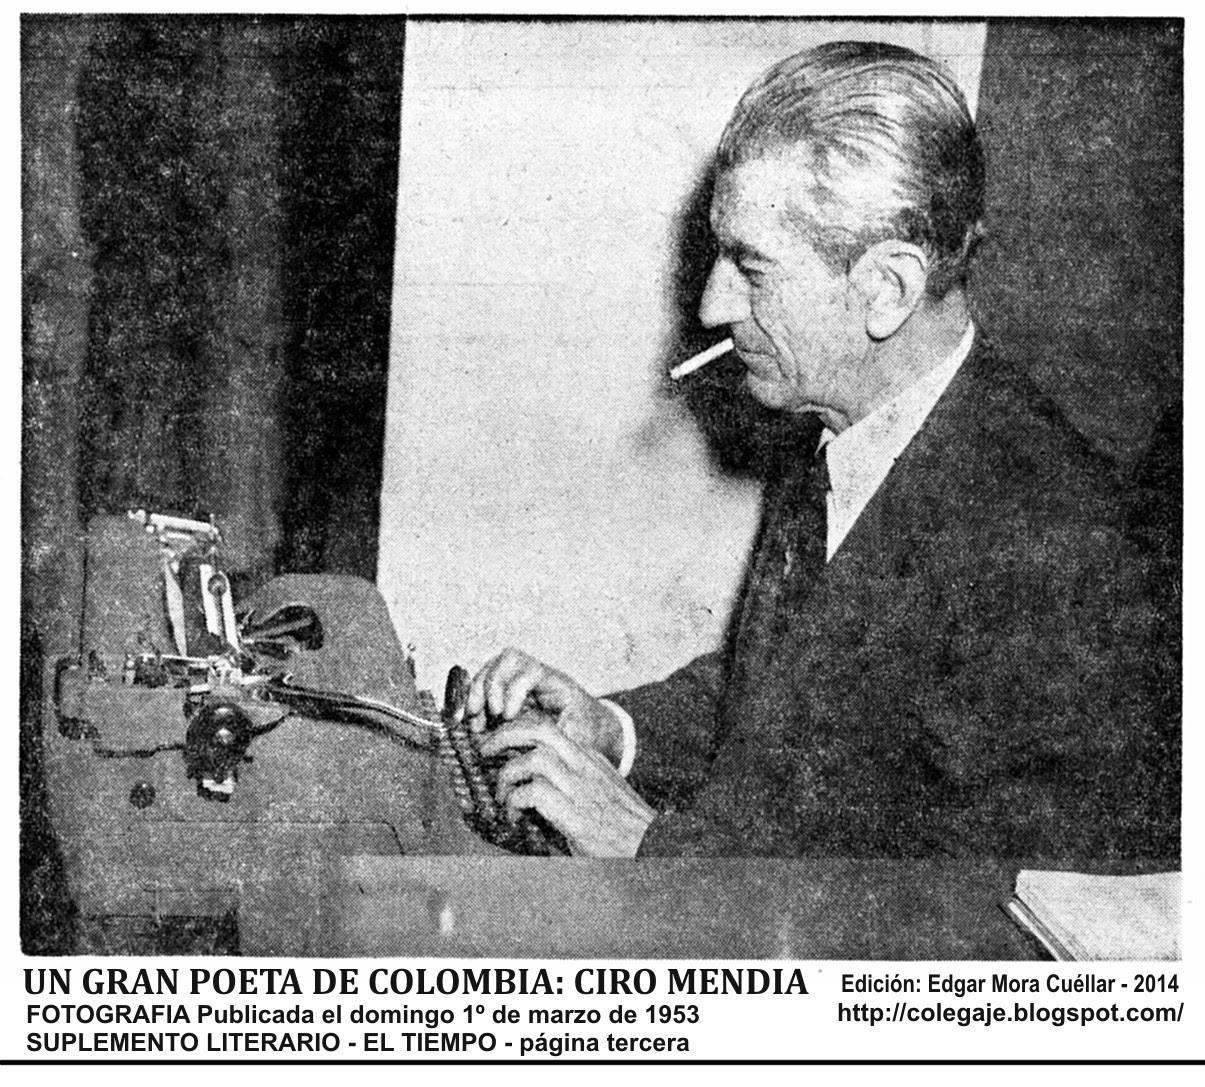 Carlos Edmundo Mejía Ángel